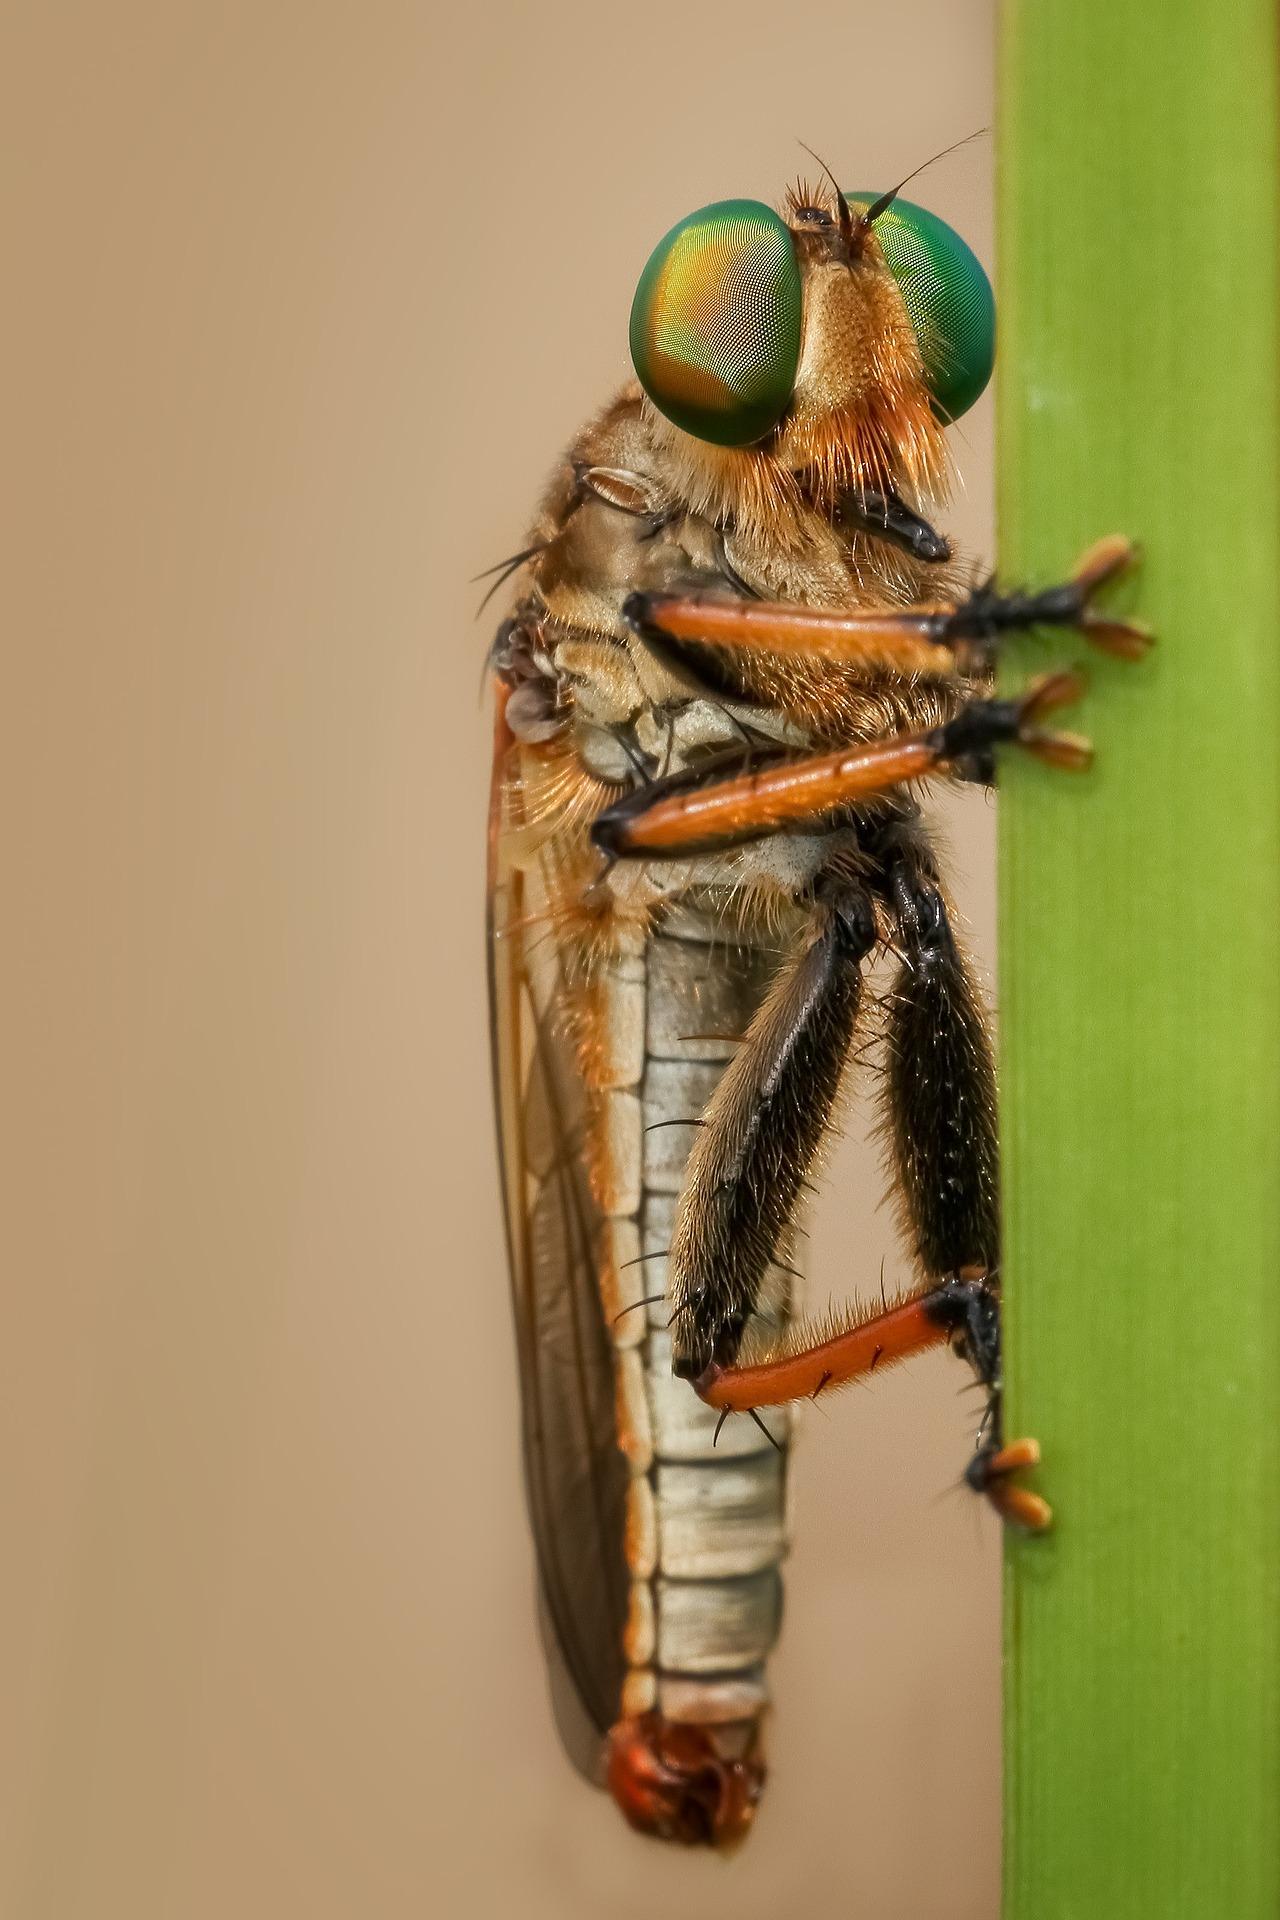 robberfly-1142401_1920